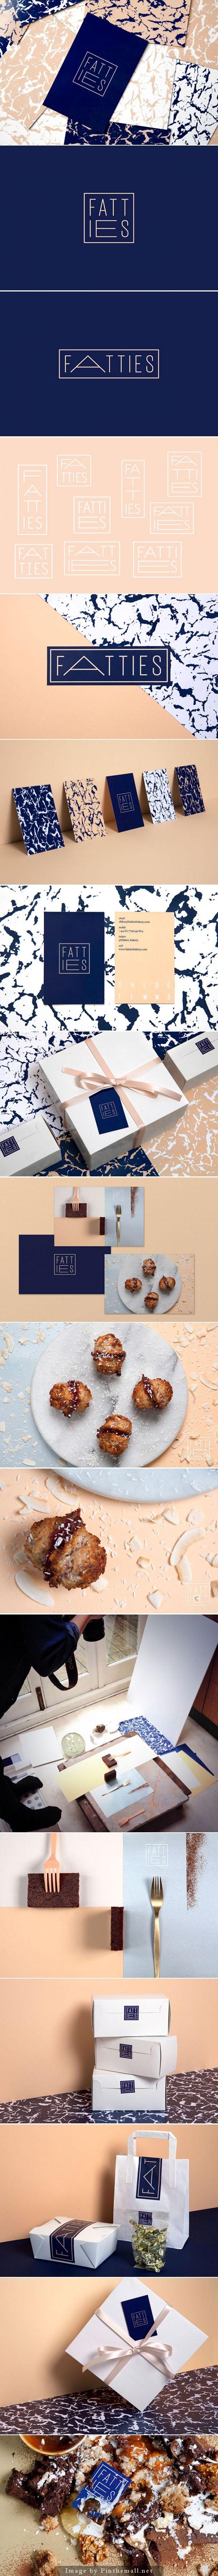 Fatties Bakery | by Dot-Dash